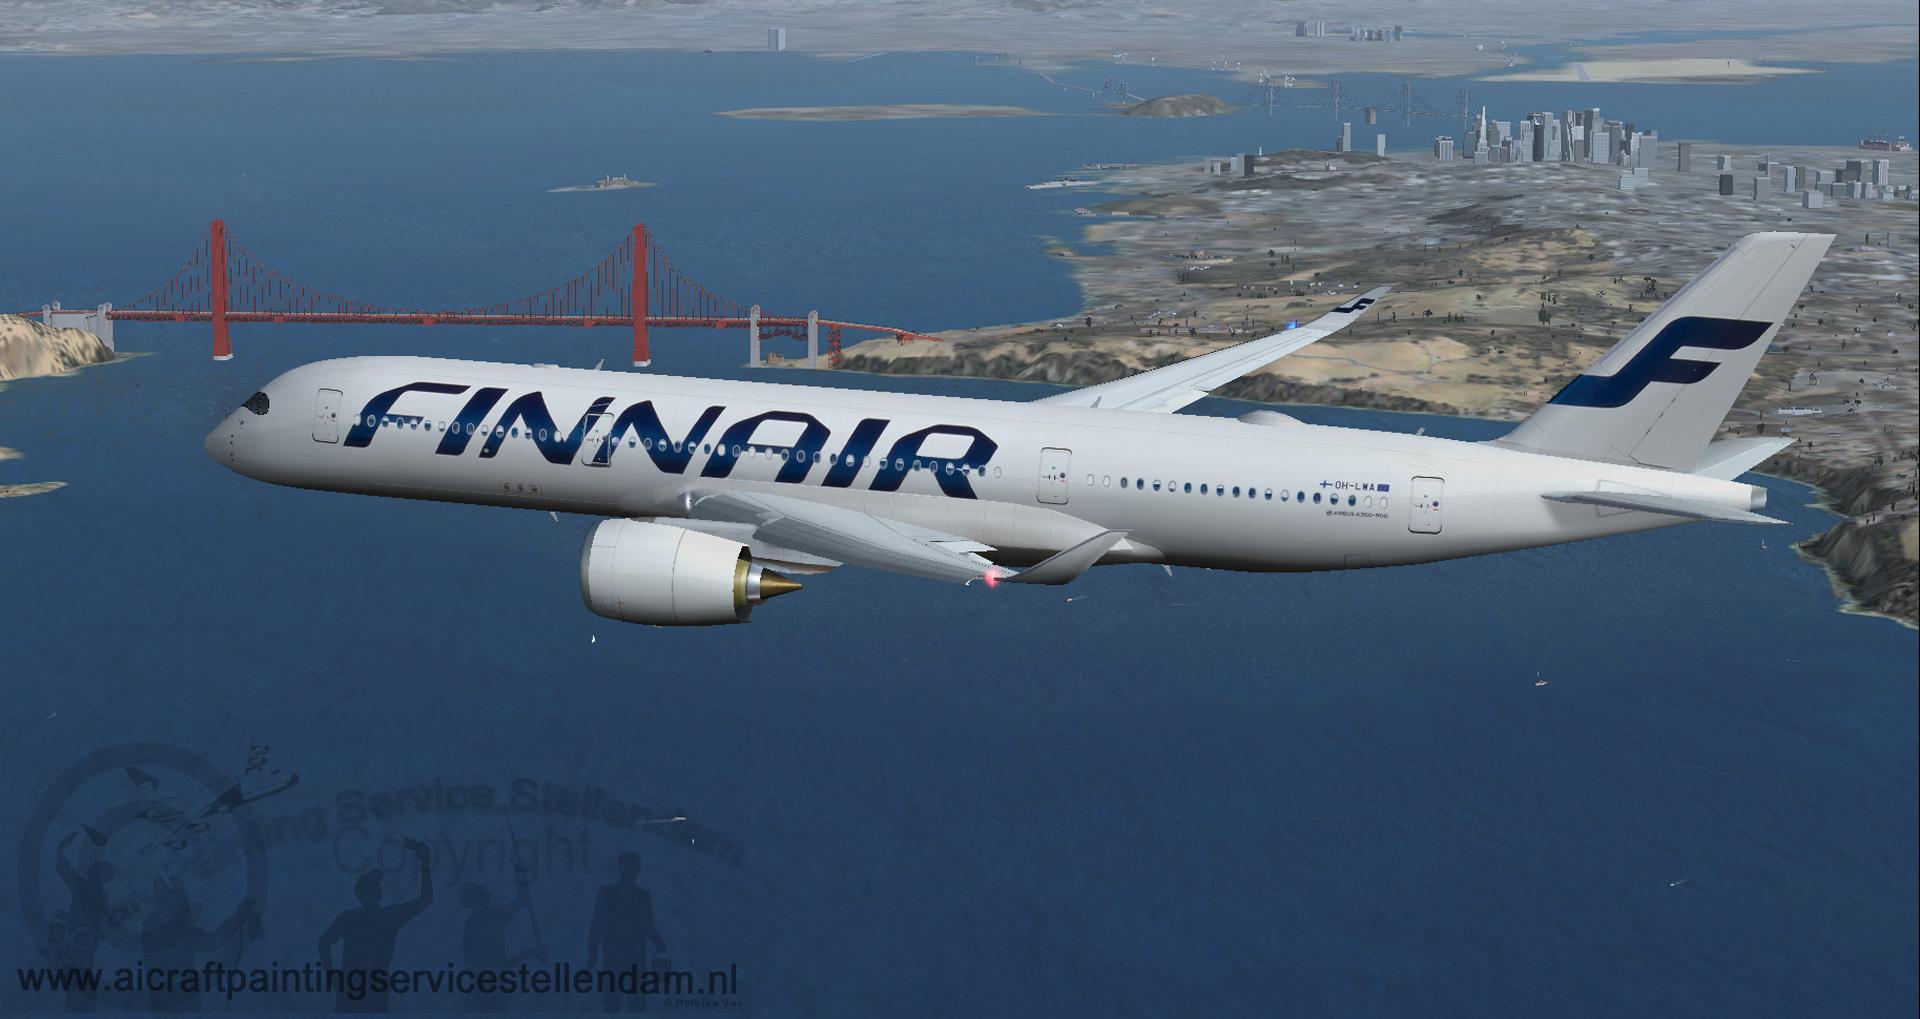 FSP_AirbusA350-941XWB_Finnair_OH-LWA_FSX3